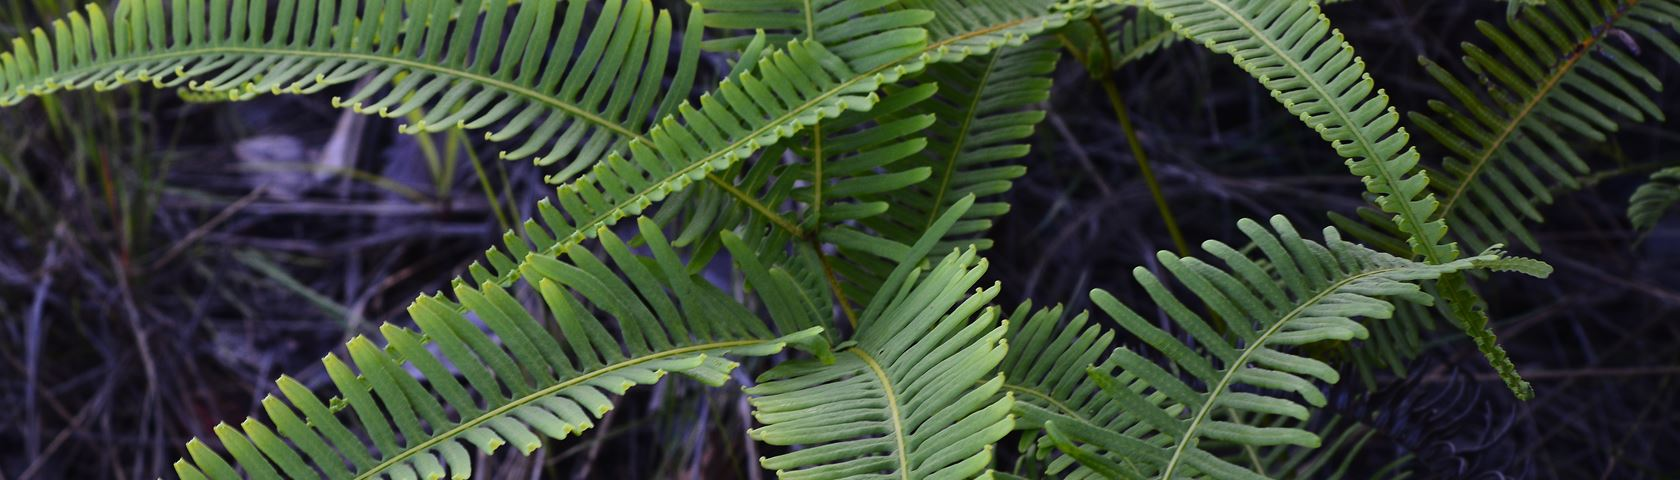 Forest Leaf